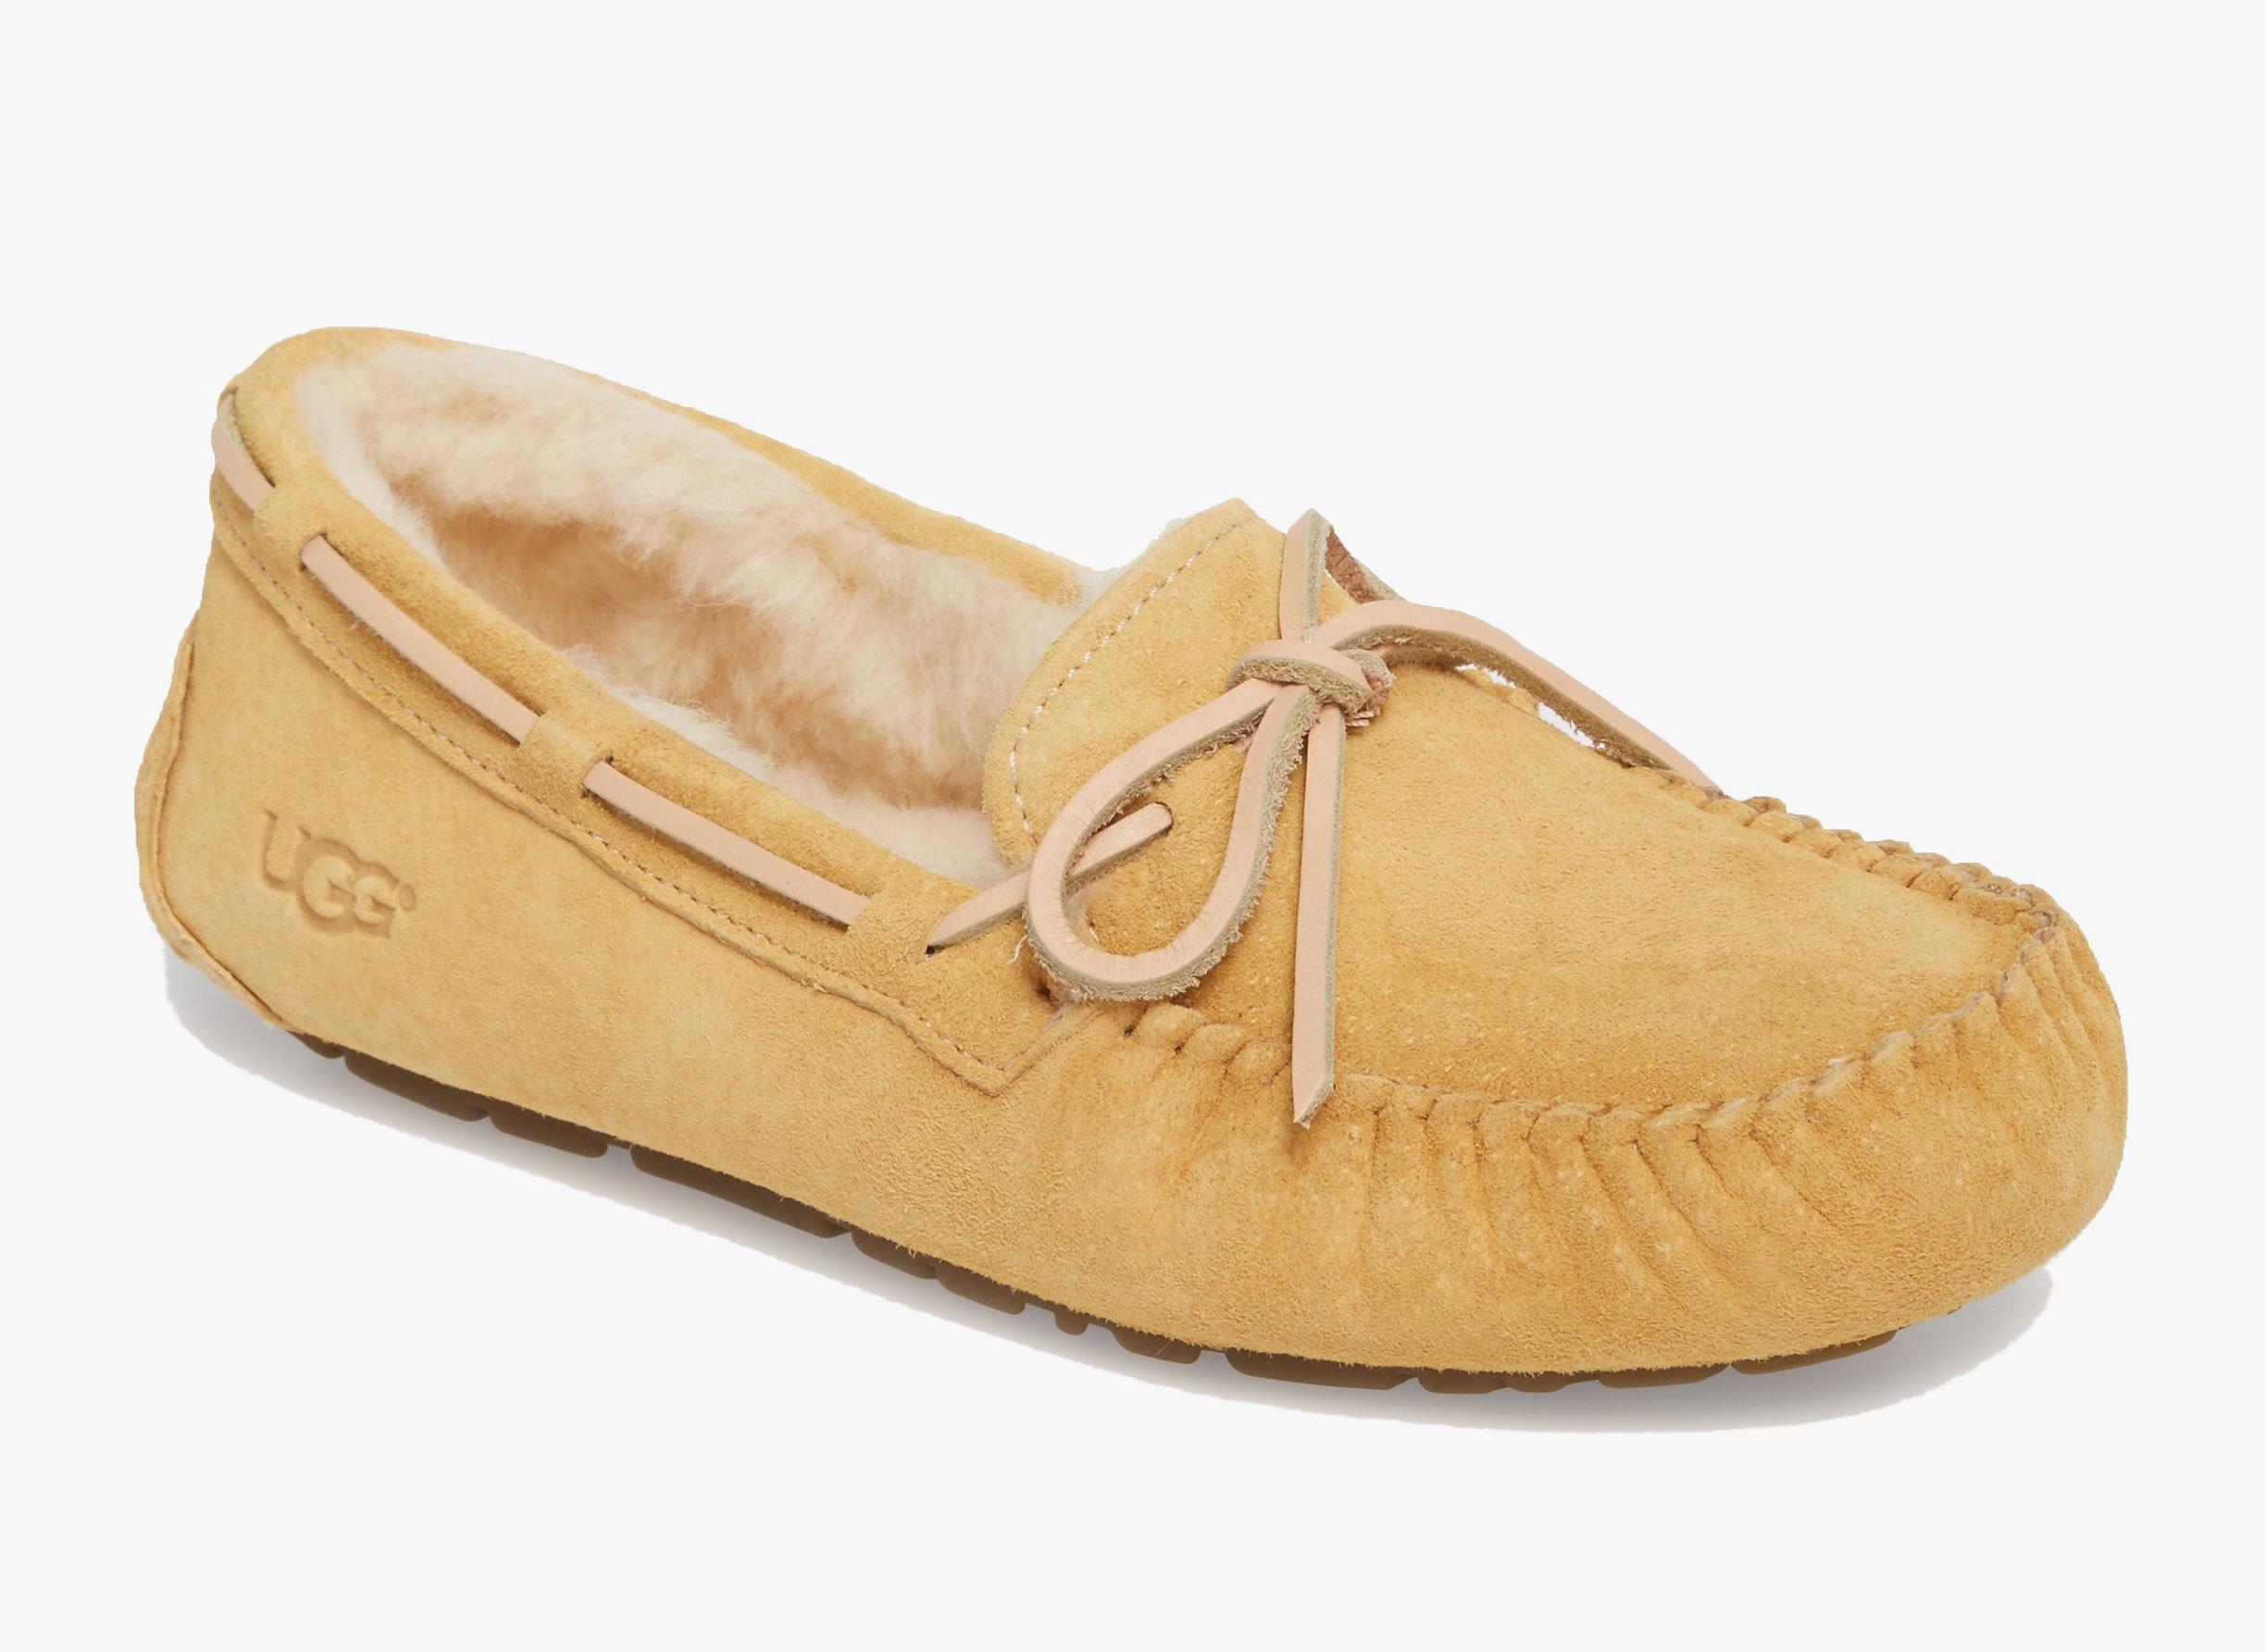 Gift Guides Travel Shop footwear shoe beige slipper walking shoe outdoor shoe product product design